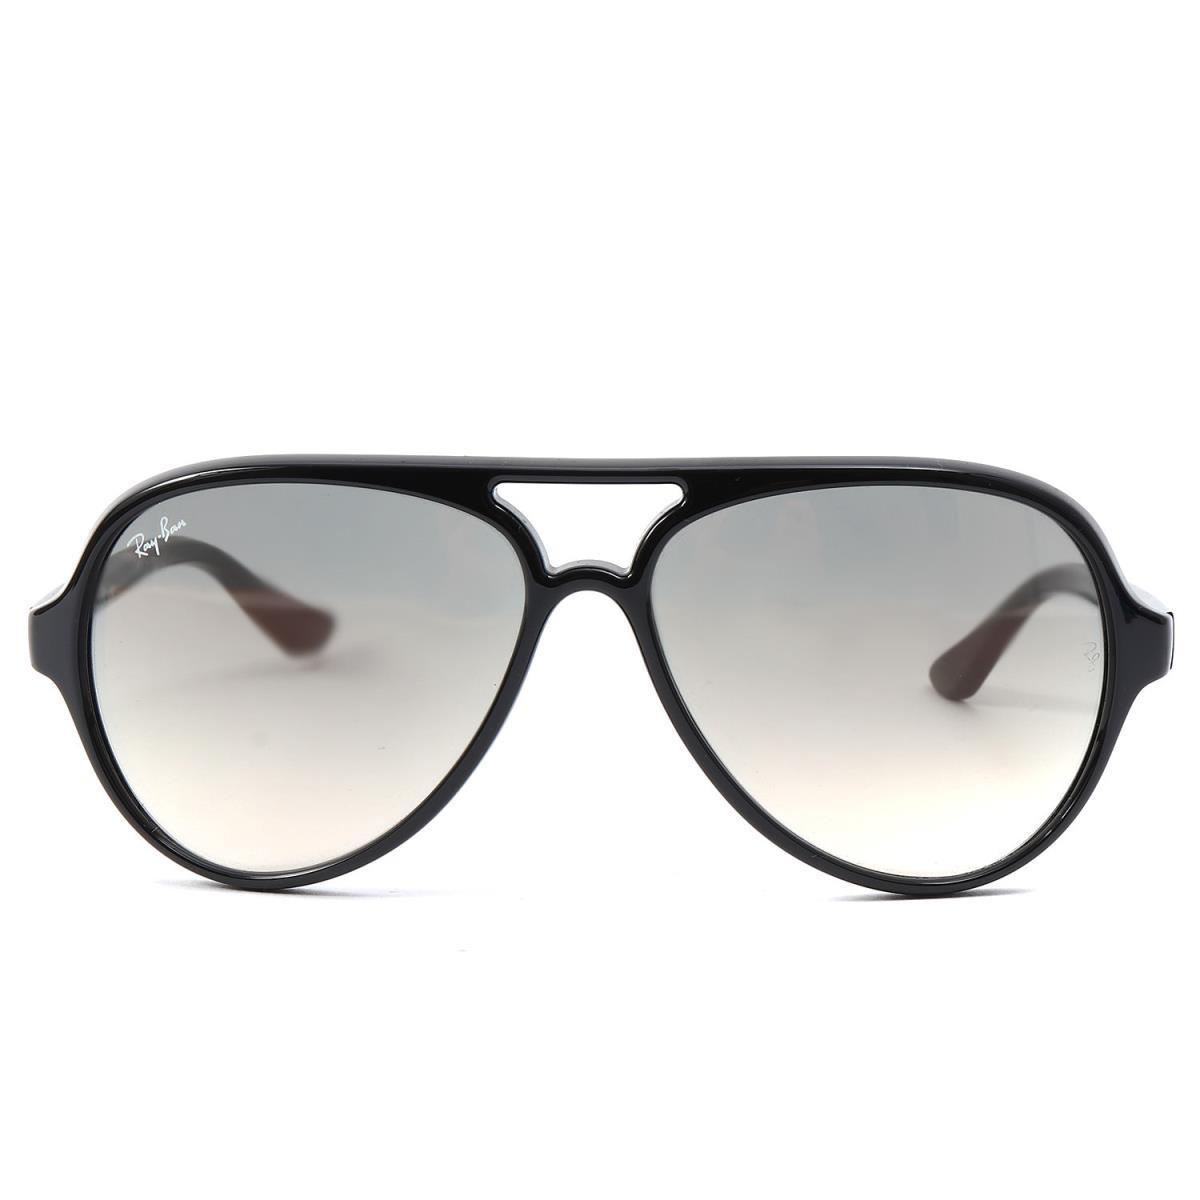 845939a4d8e25 Ray Ban (Ray-Ban) gradation lens teardrop sunglasses (RB4125 CATS 5000)  black